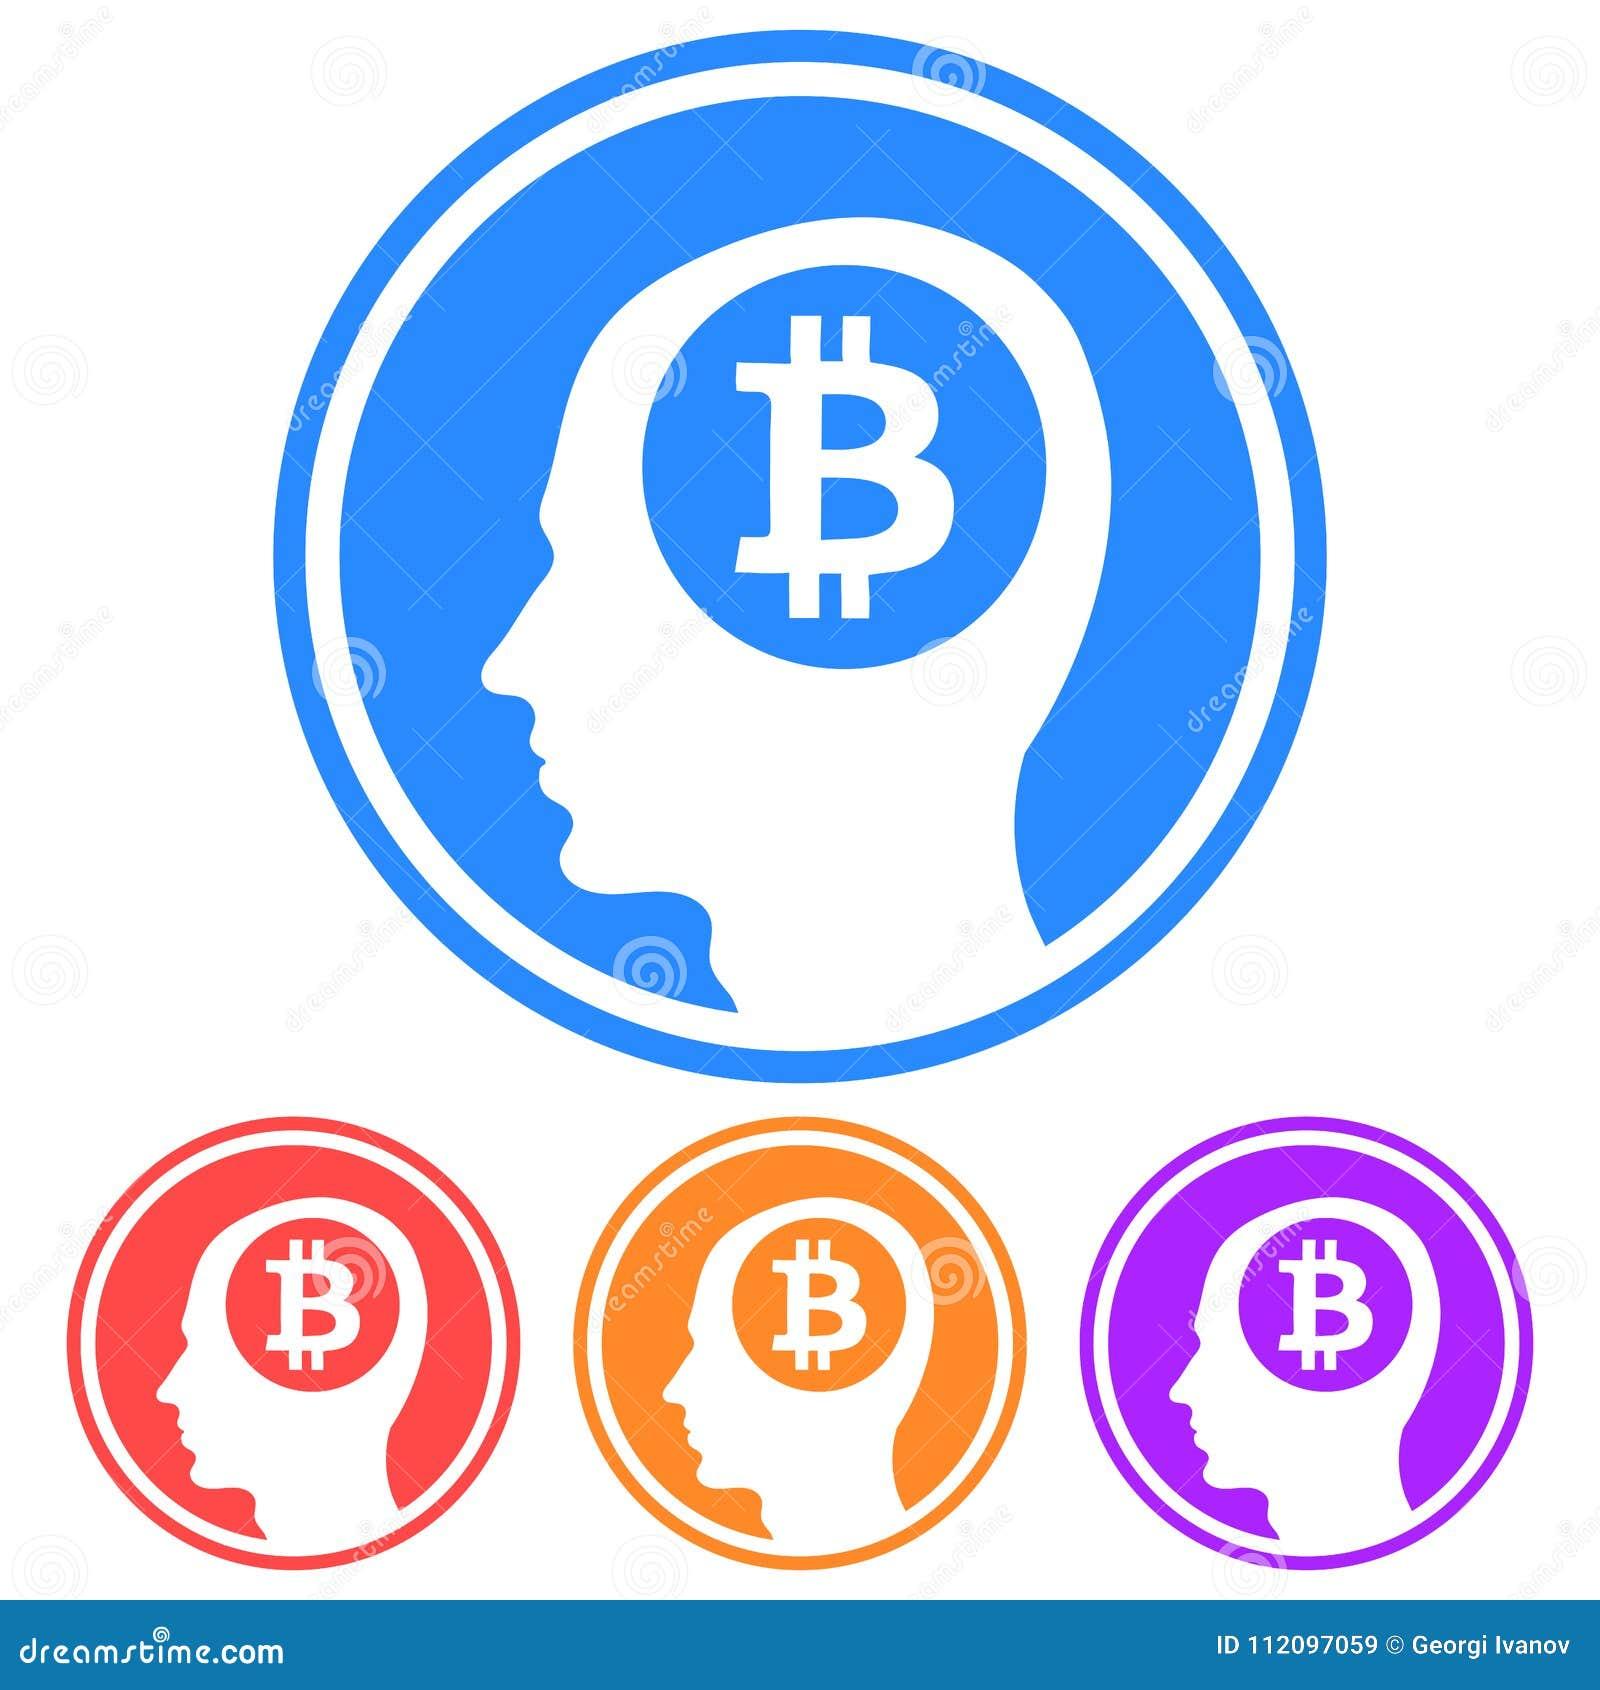 Circular, Flat Thinking About Bitcoin Icon  Profile Head